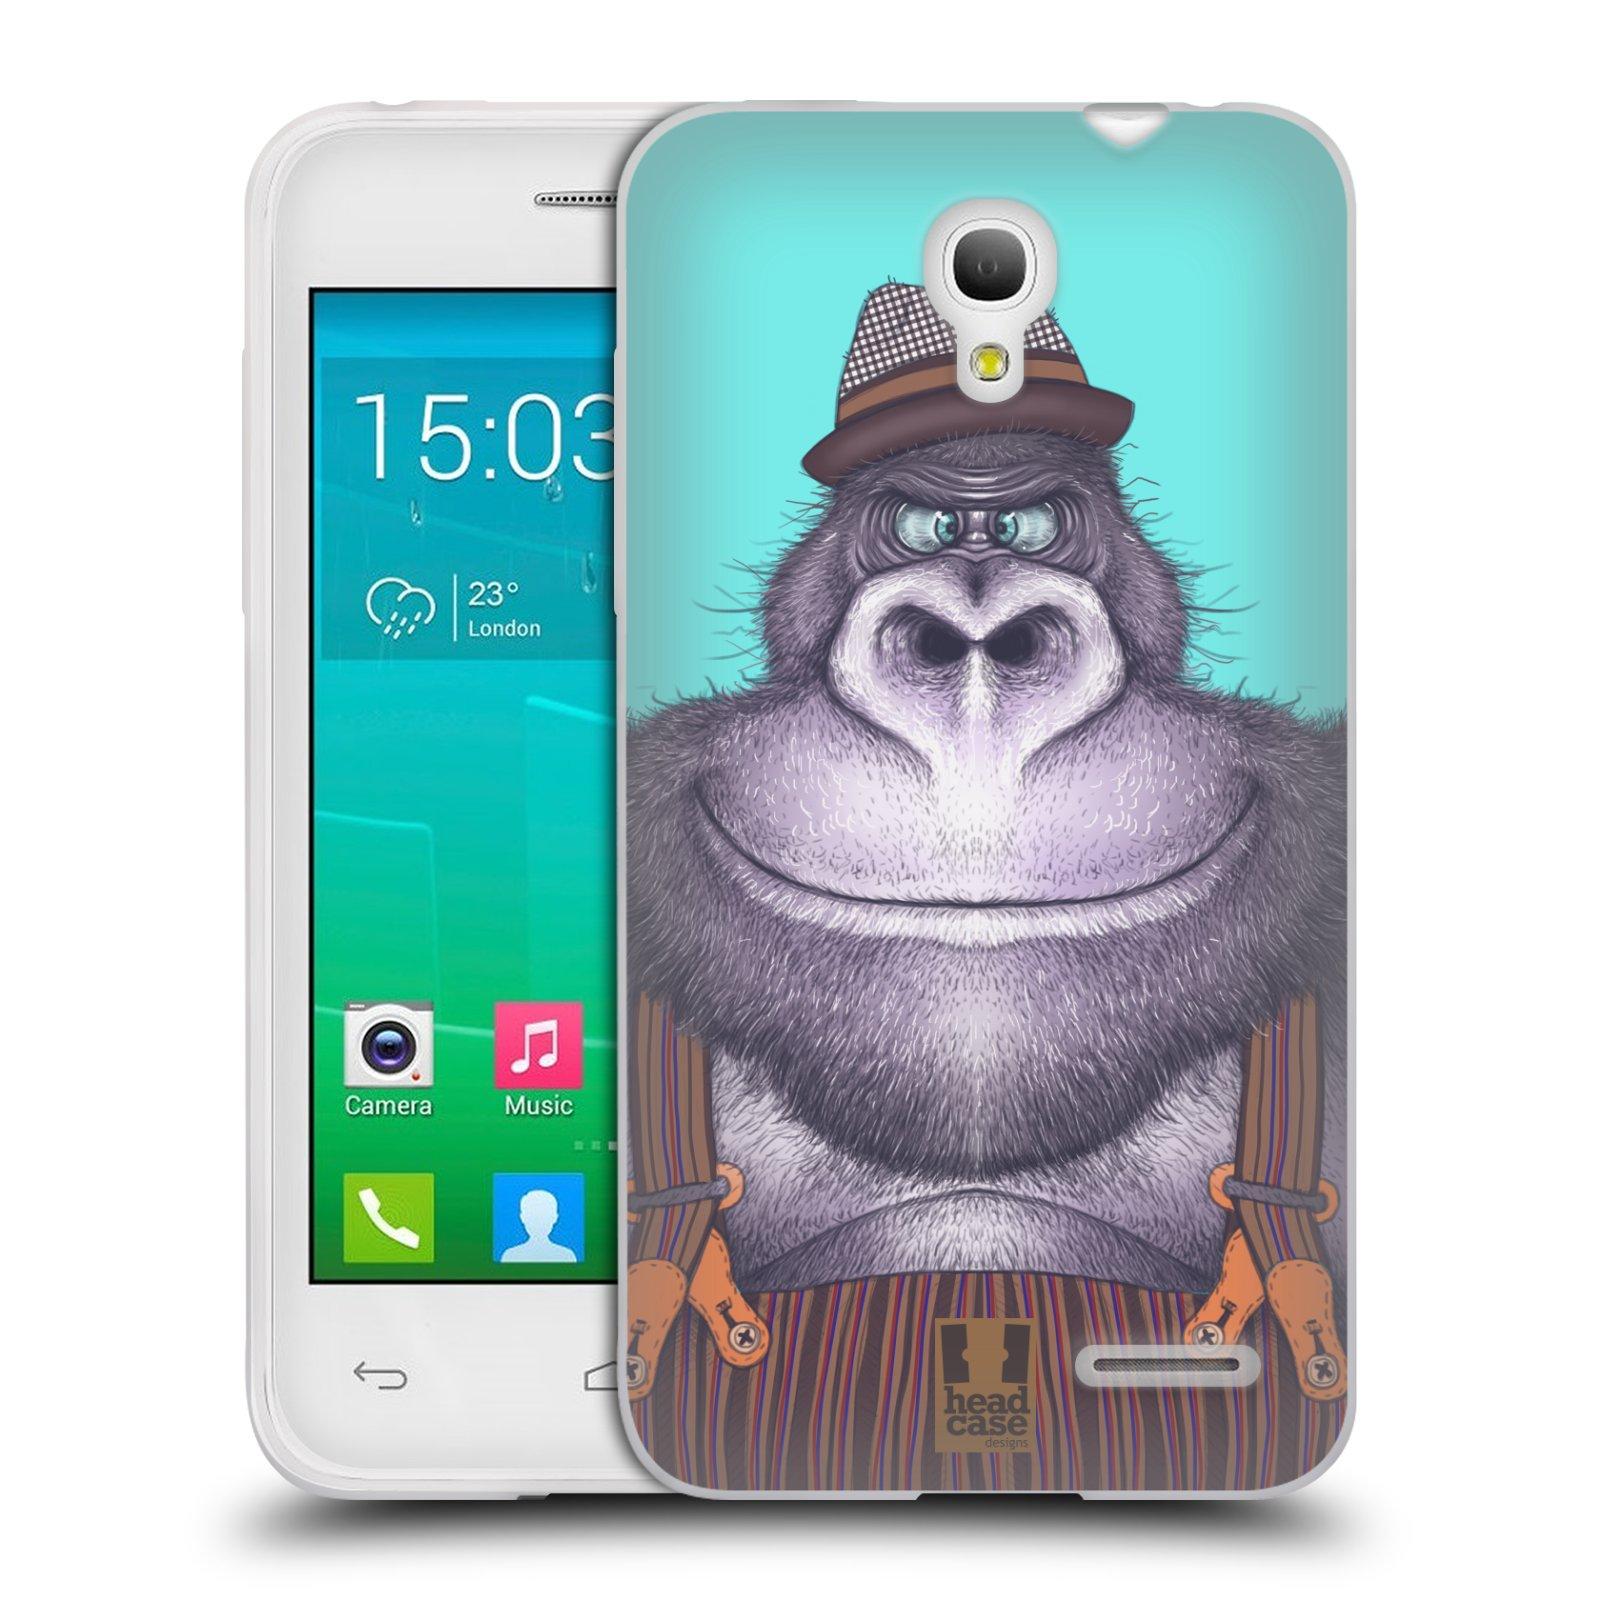 HEAD CASE silikonový obal na mobil Alcatel POP S3 OT-5050Y vzor Kreslená zvířátka gorila